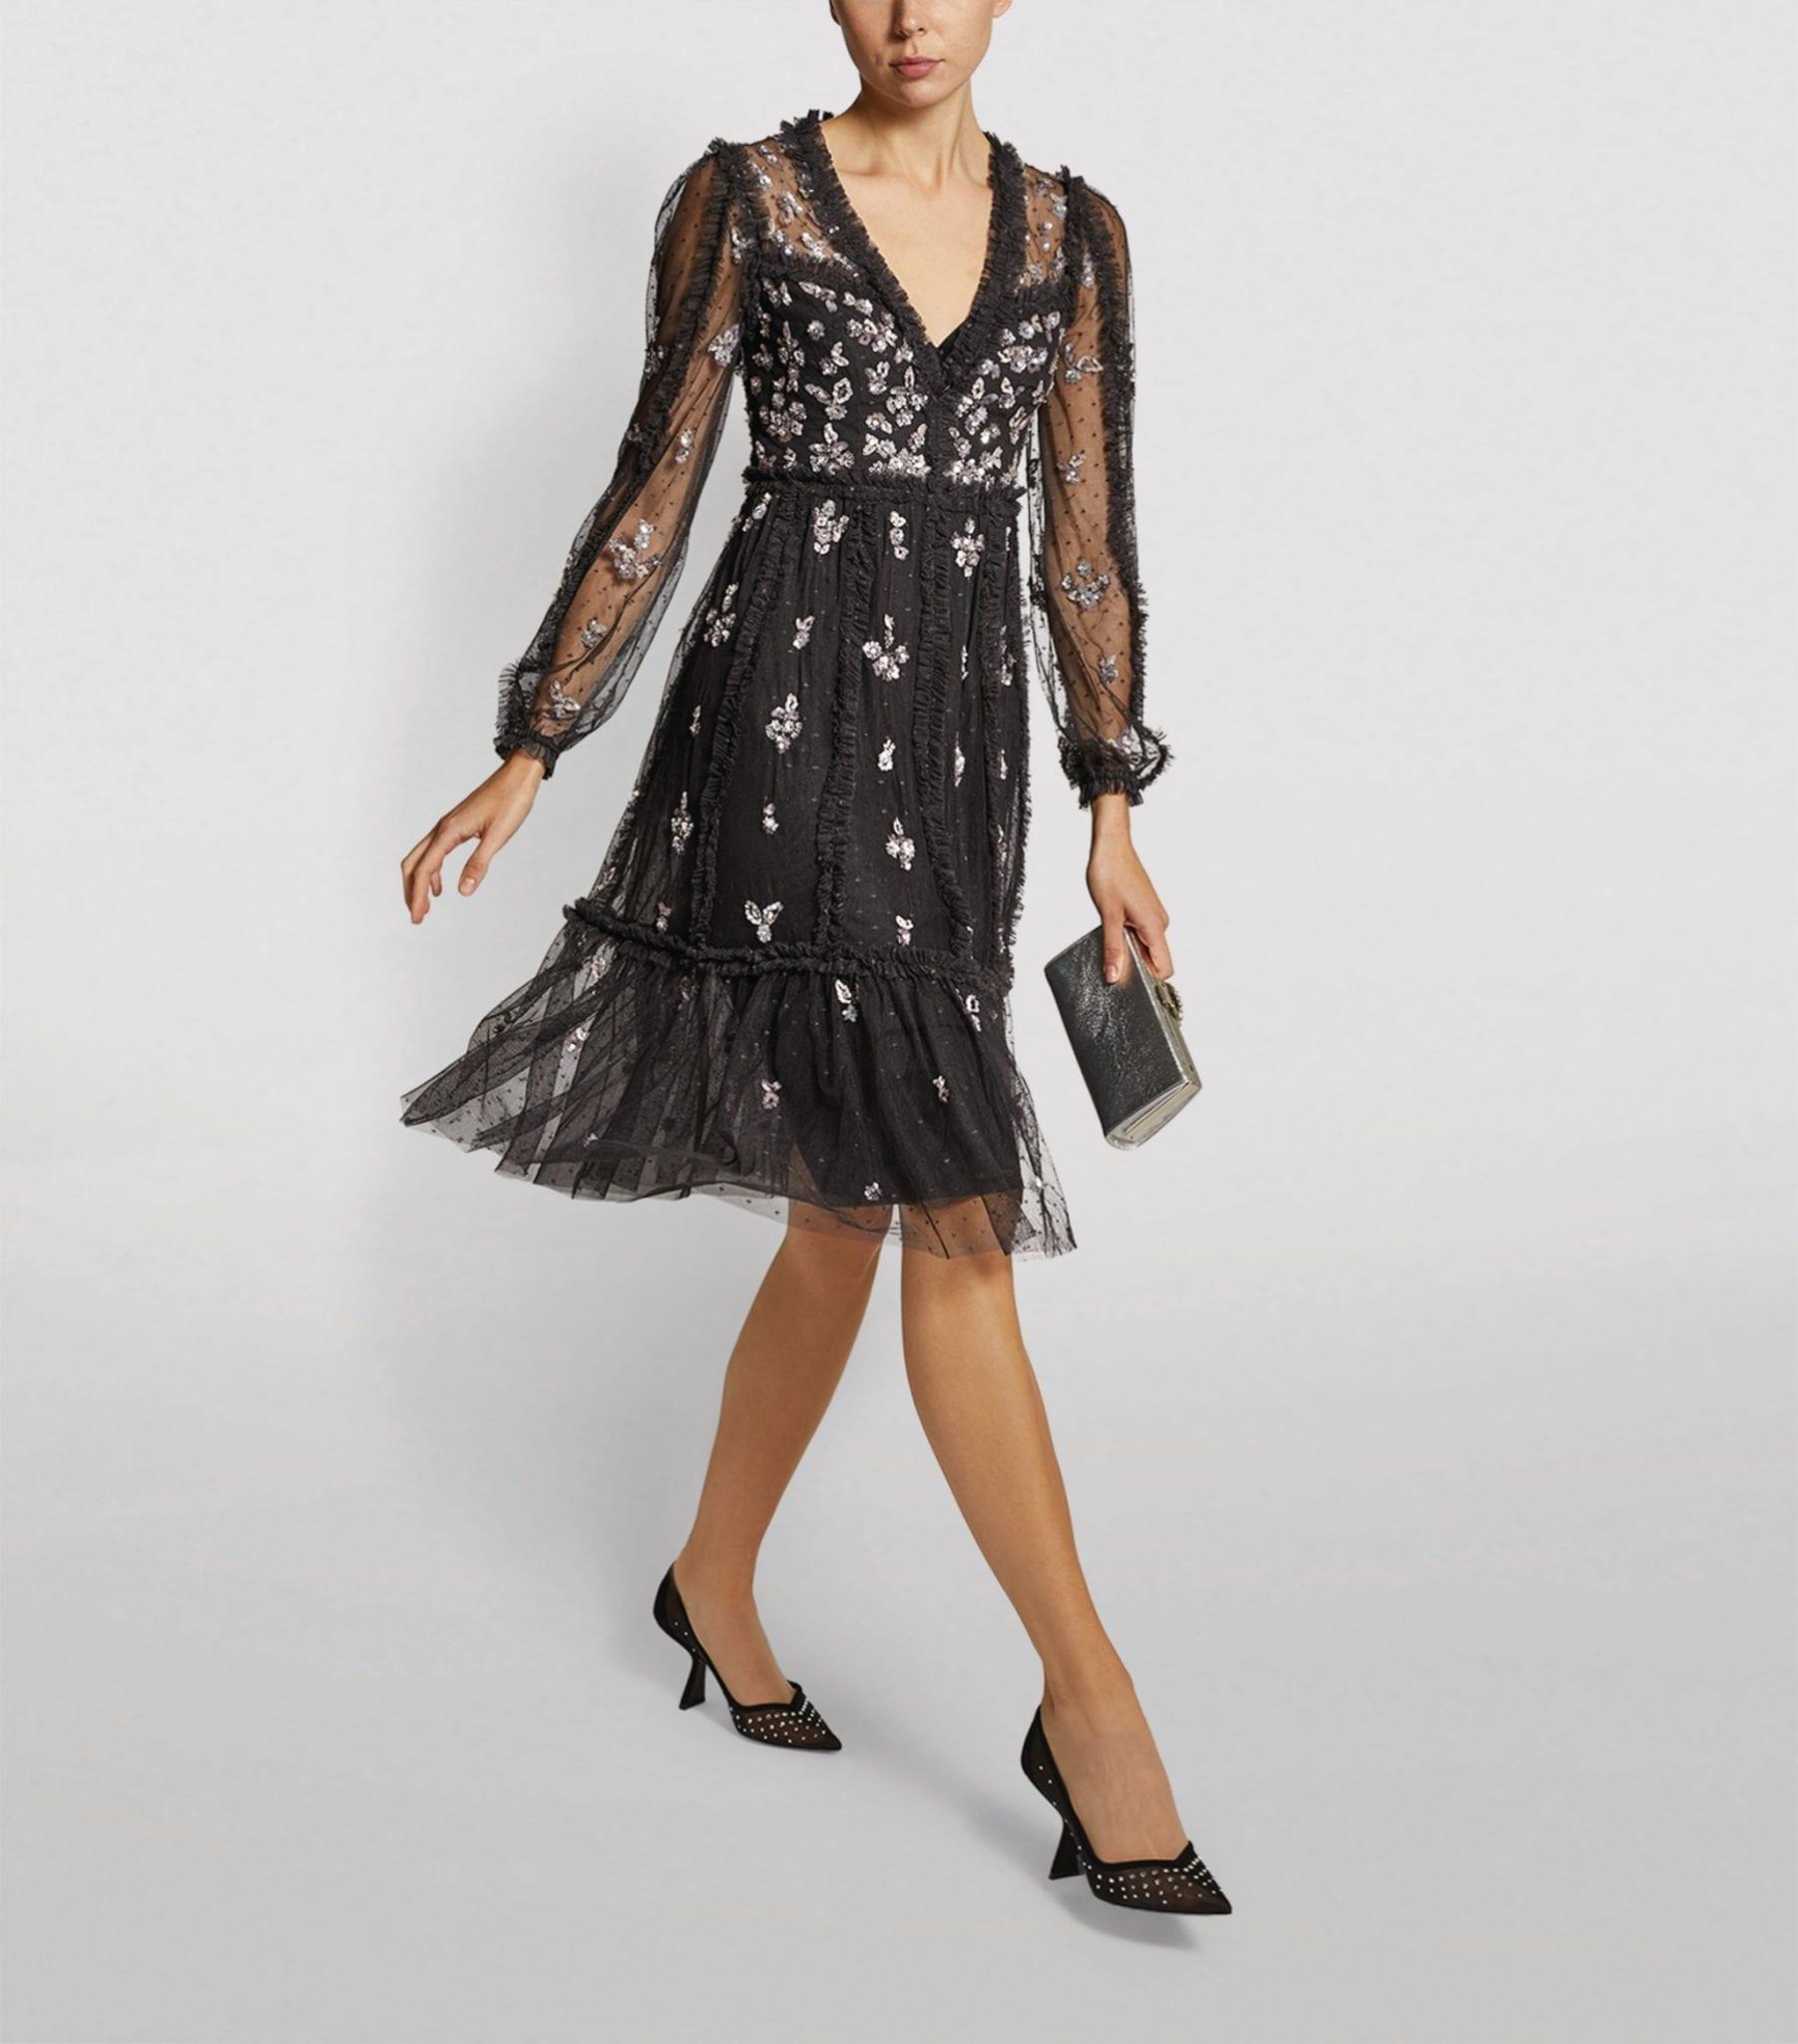 NEEDLE & THREAD Penelope Shimmer Tulle Dress